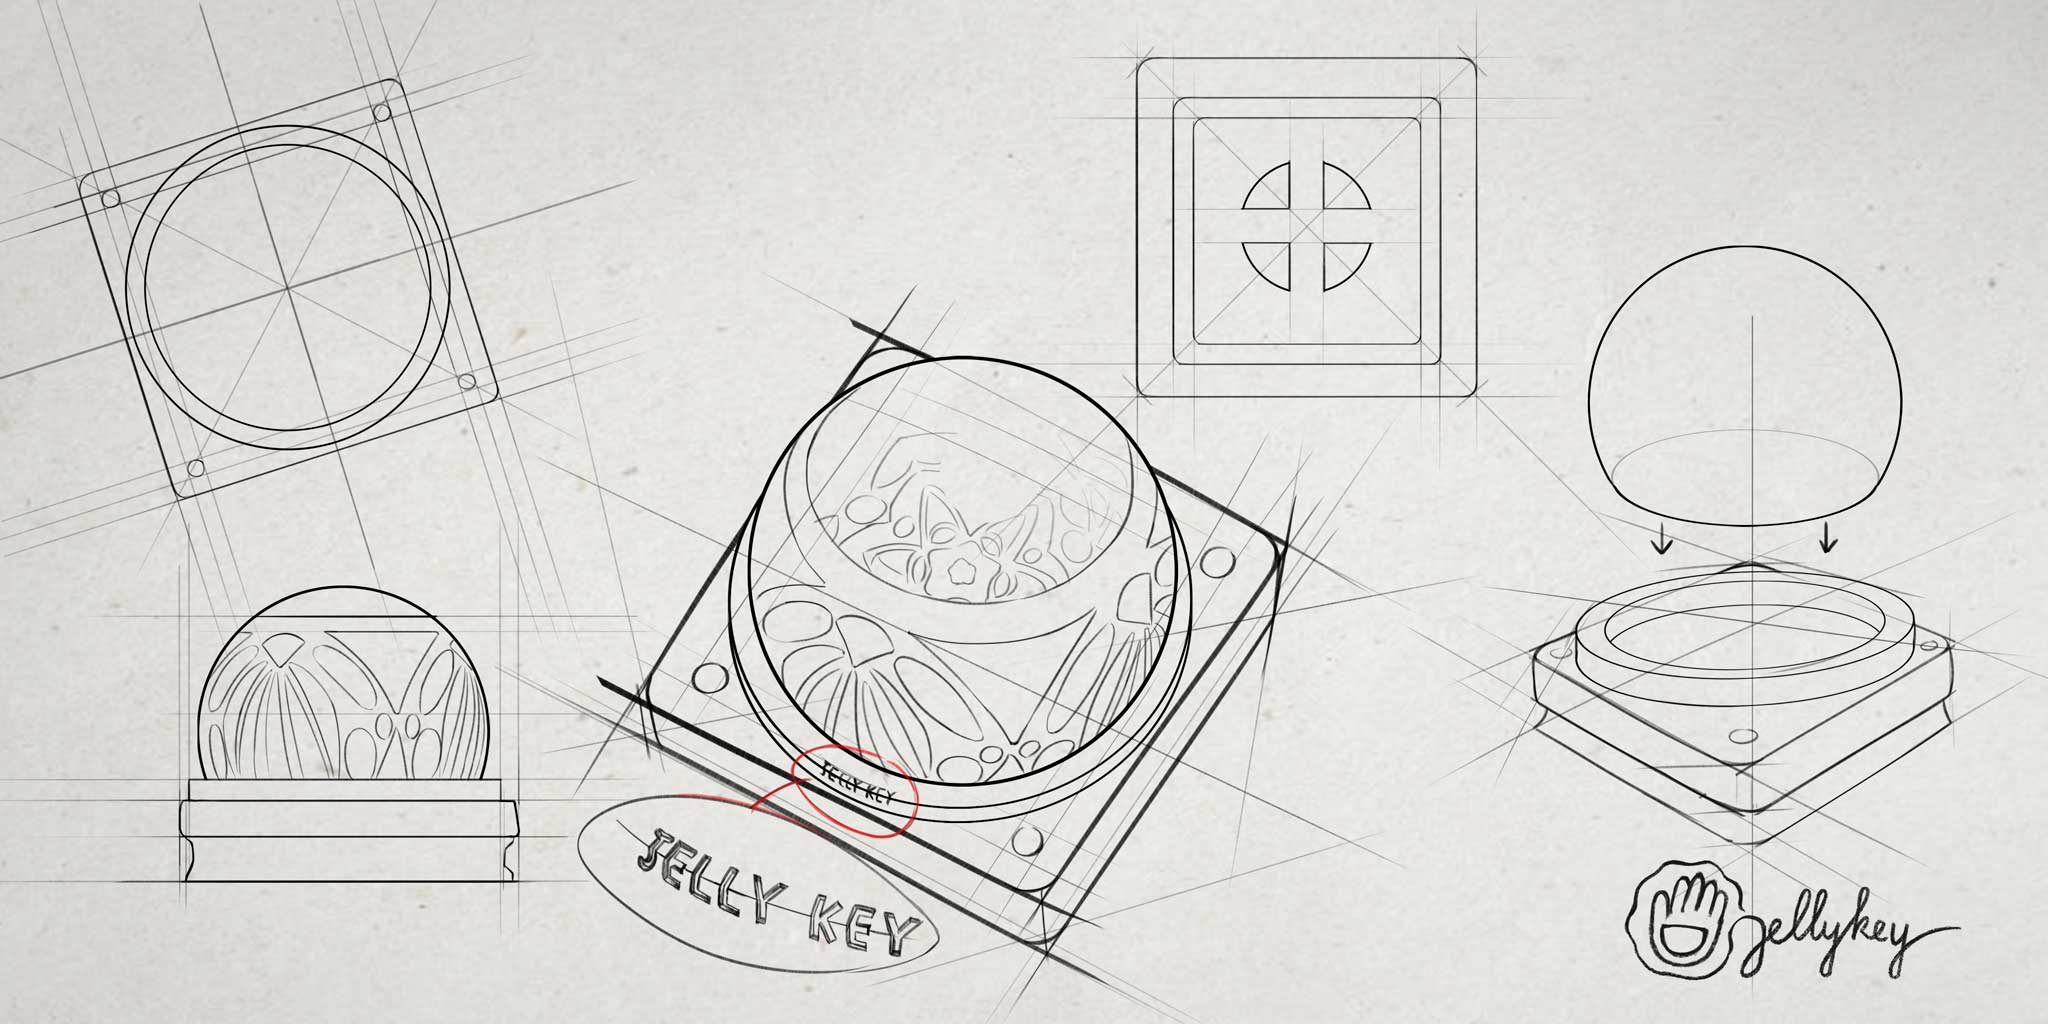 Jelly Key Sketch 1